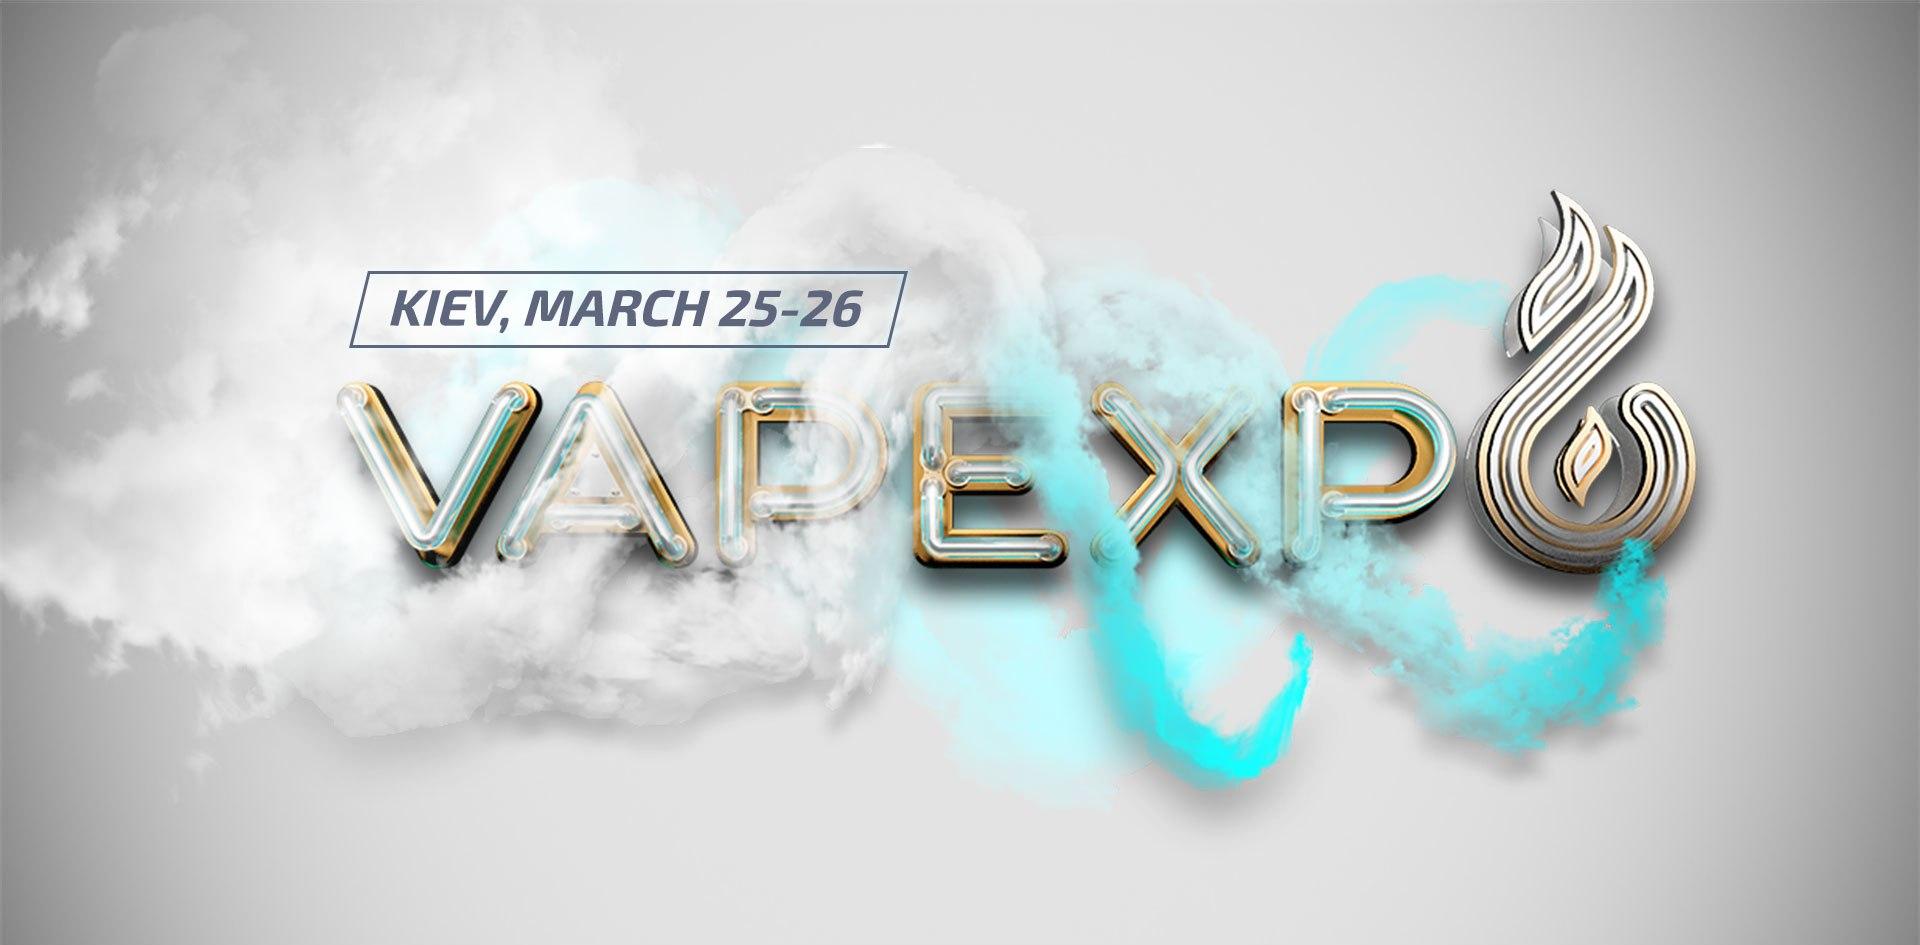 VAPE-MANIA IN THE CITY. The First Ukrainian vape-shindig VAPEXPO, Kiev, March 25-26, 2016!